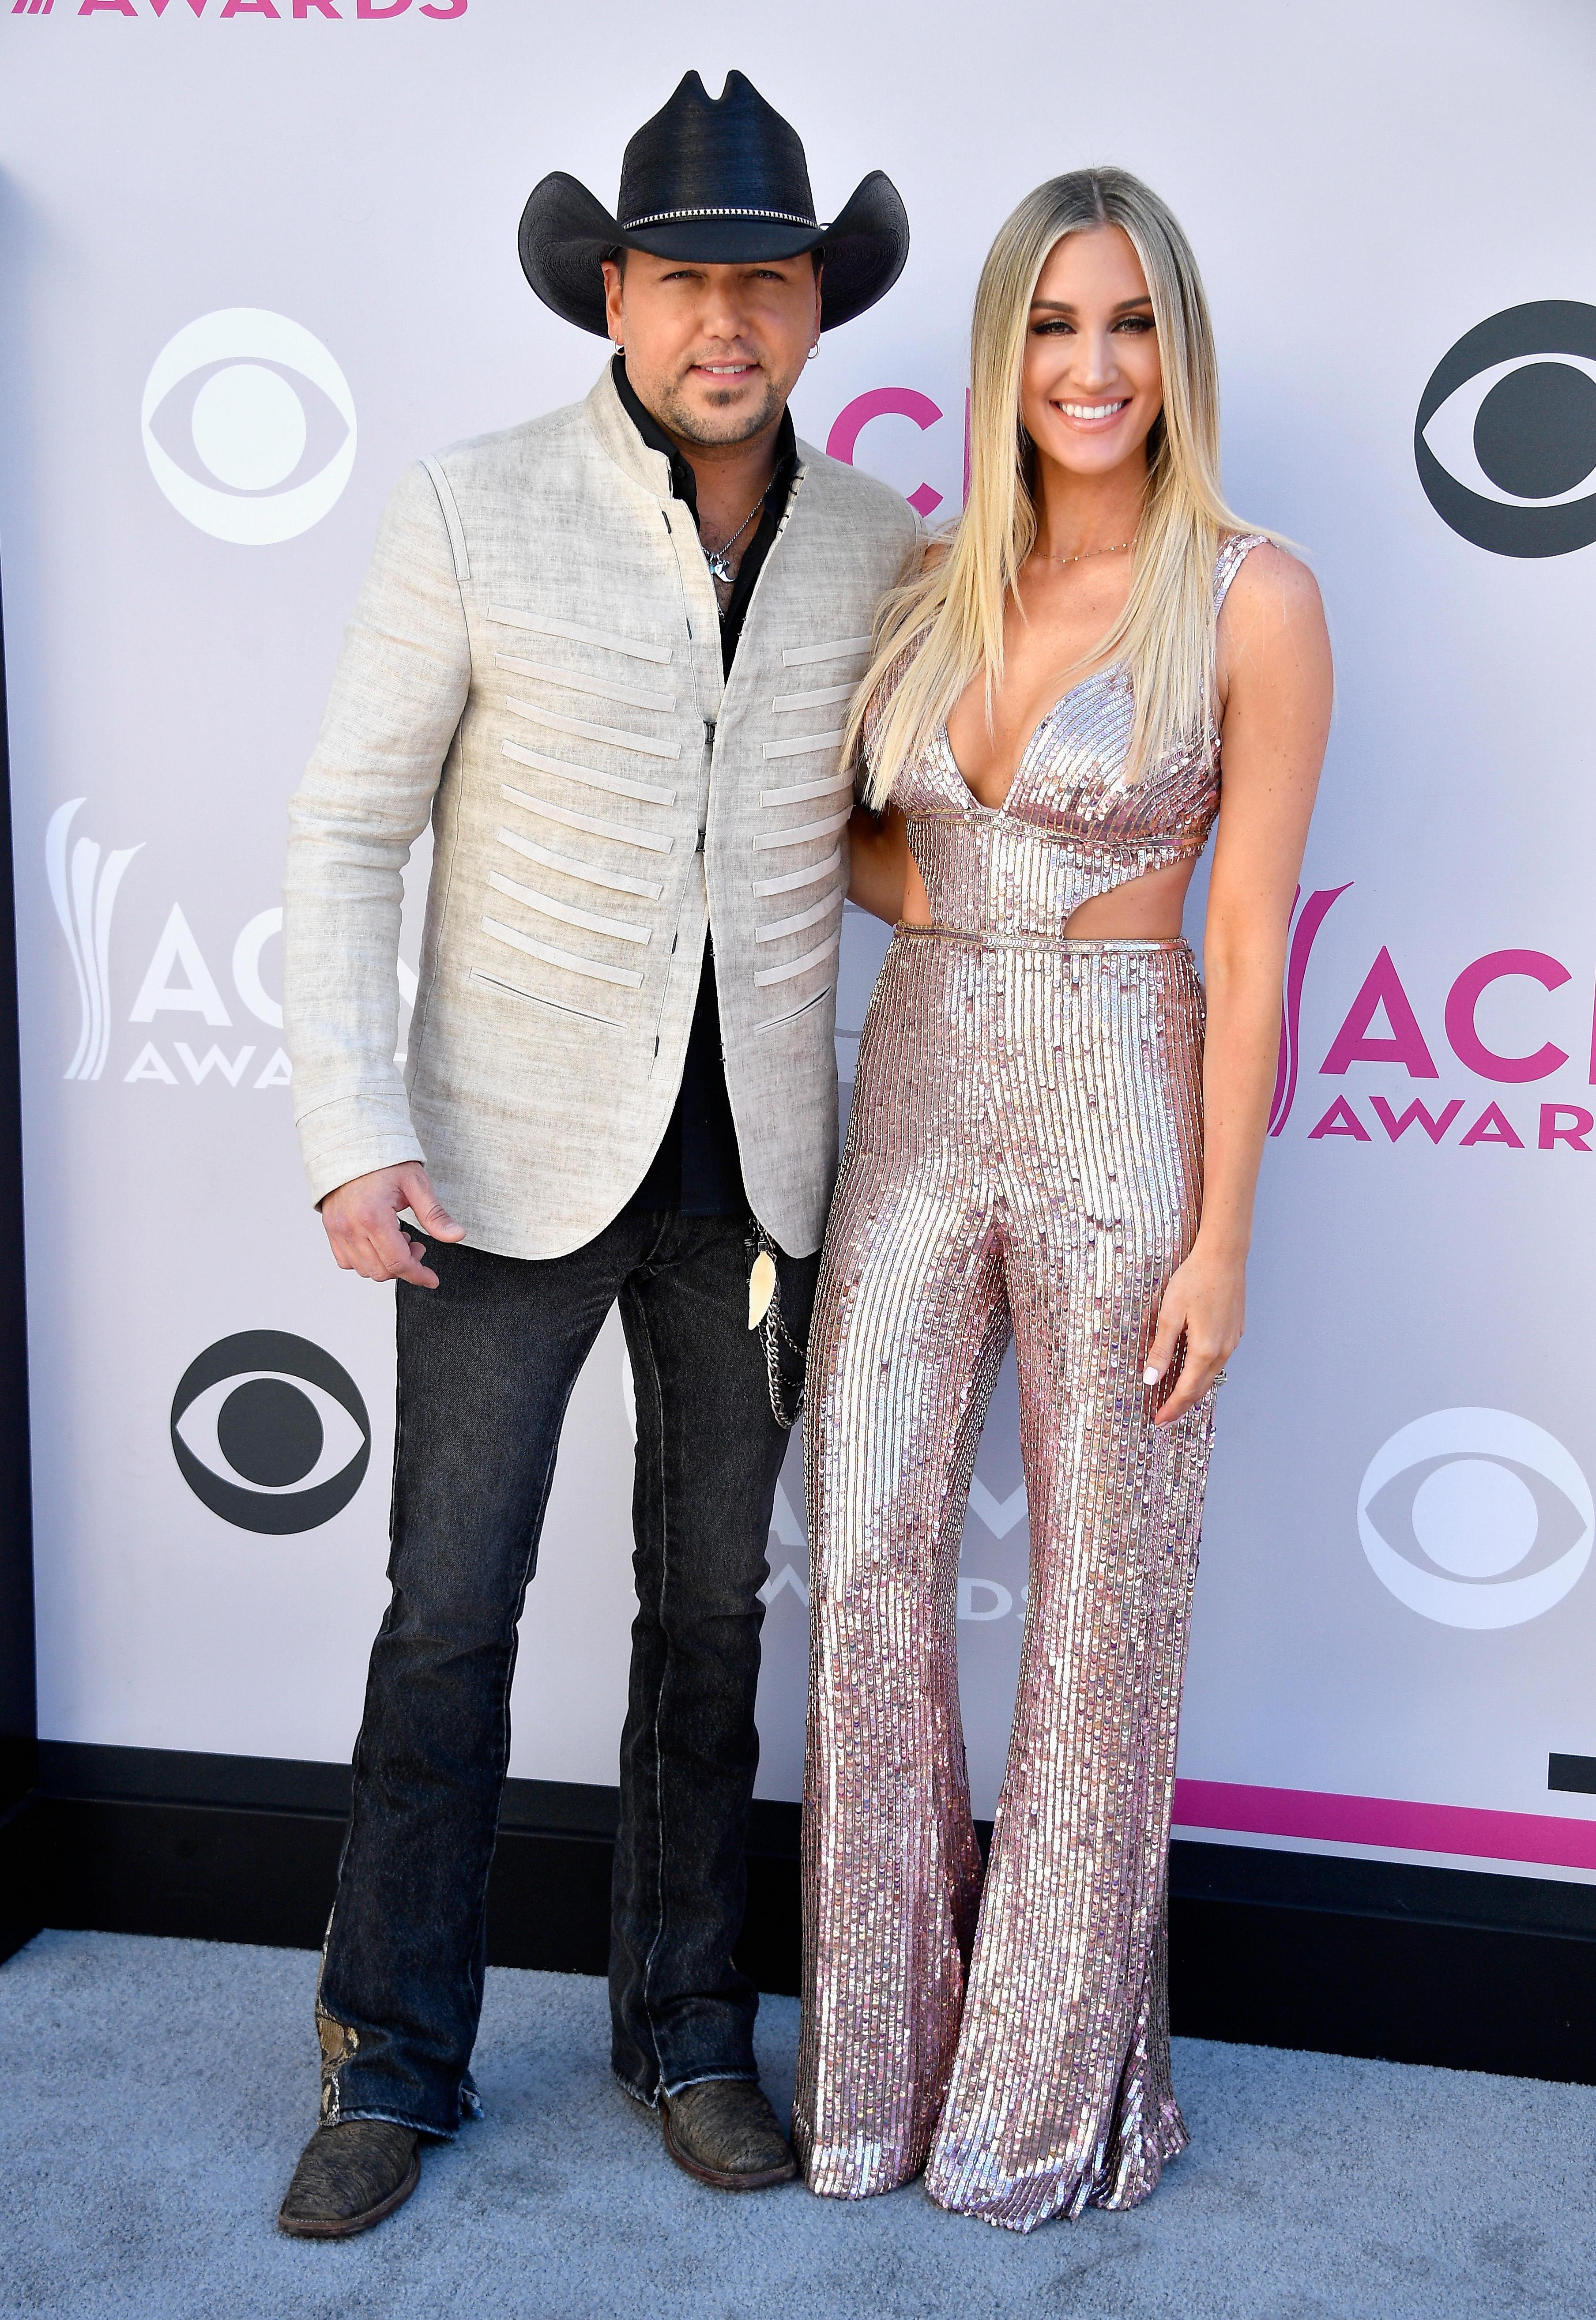 Jason Aldean And Brittany Kerr Announce Pregnancy Cbs News